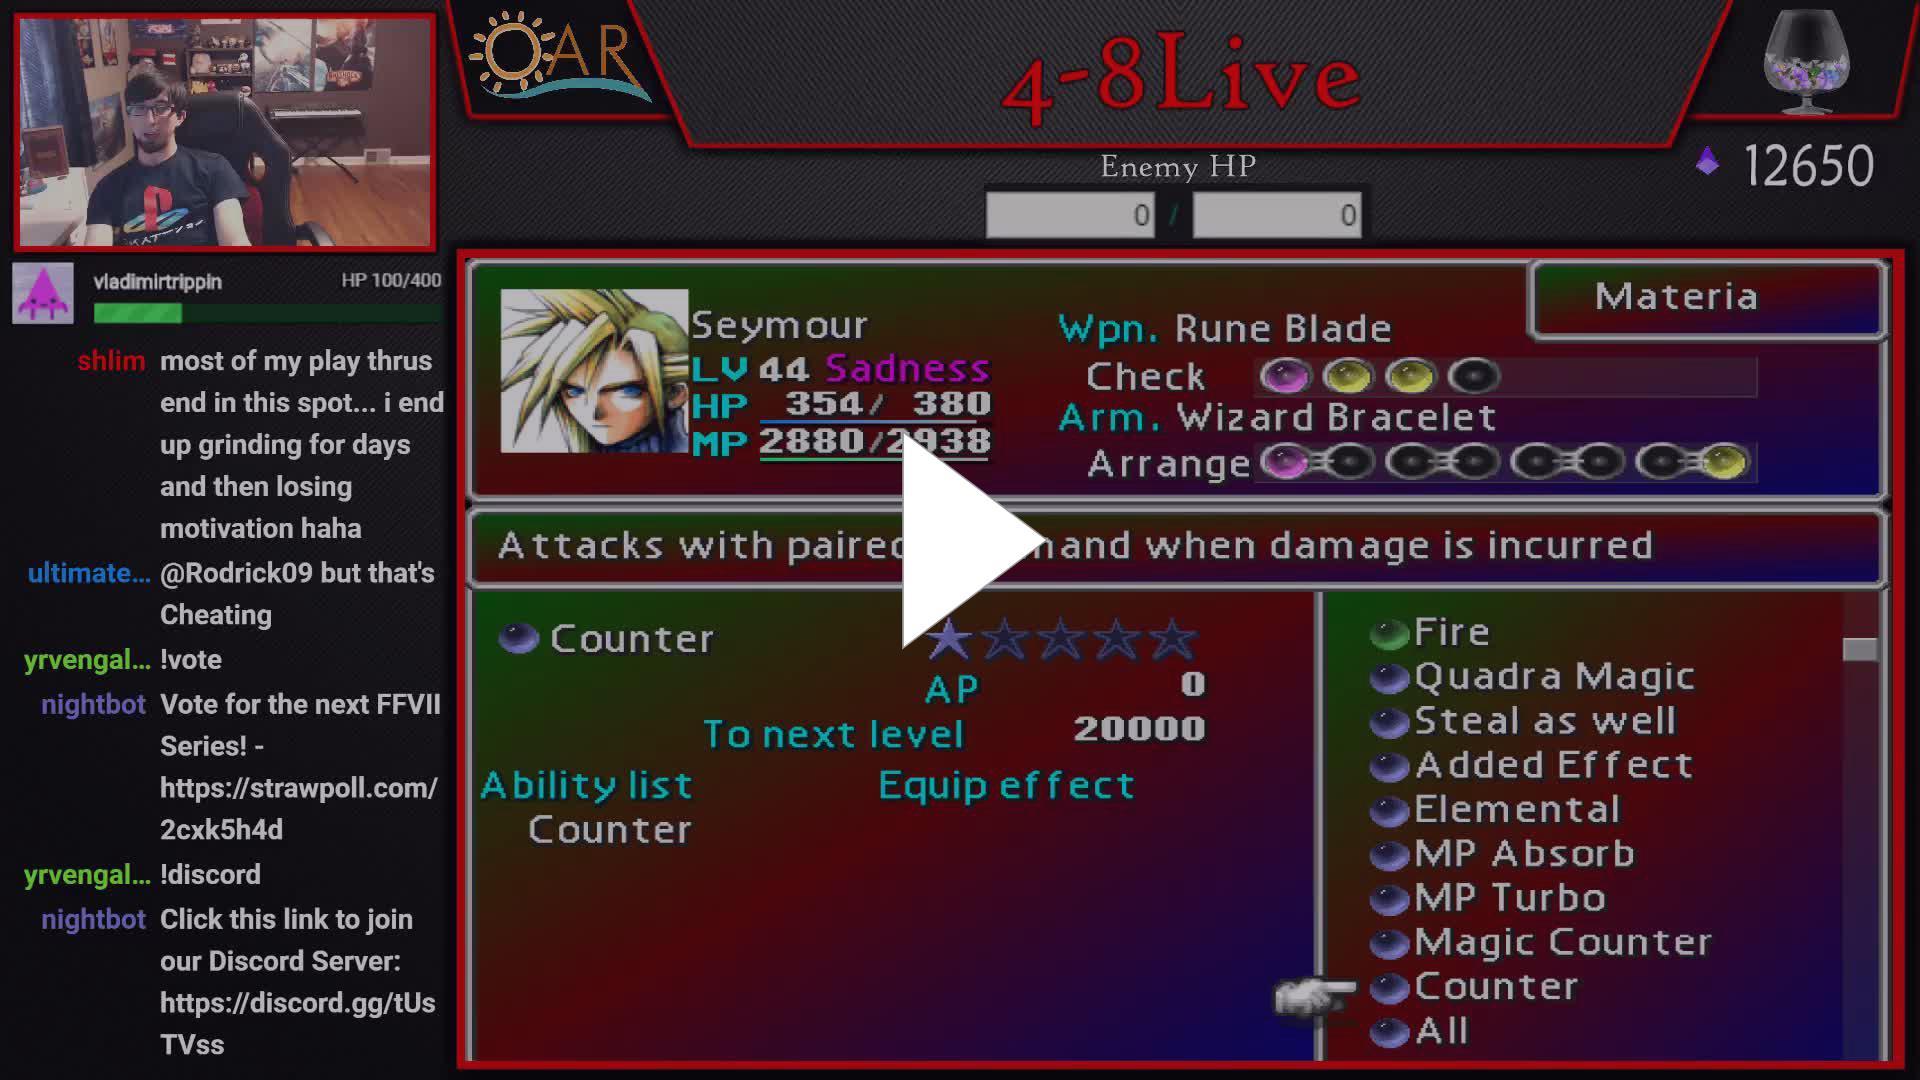 death_unites_us - Final Fantasy VII HP to MP Challenge